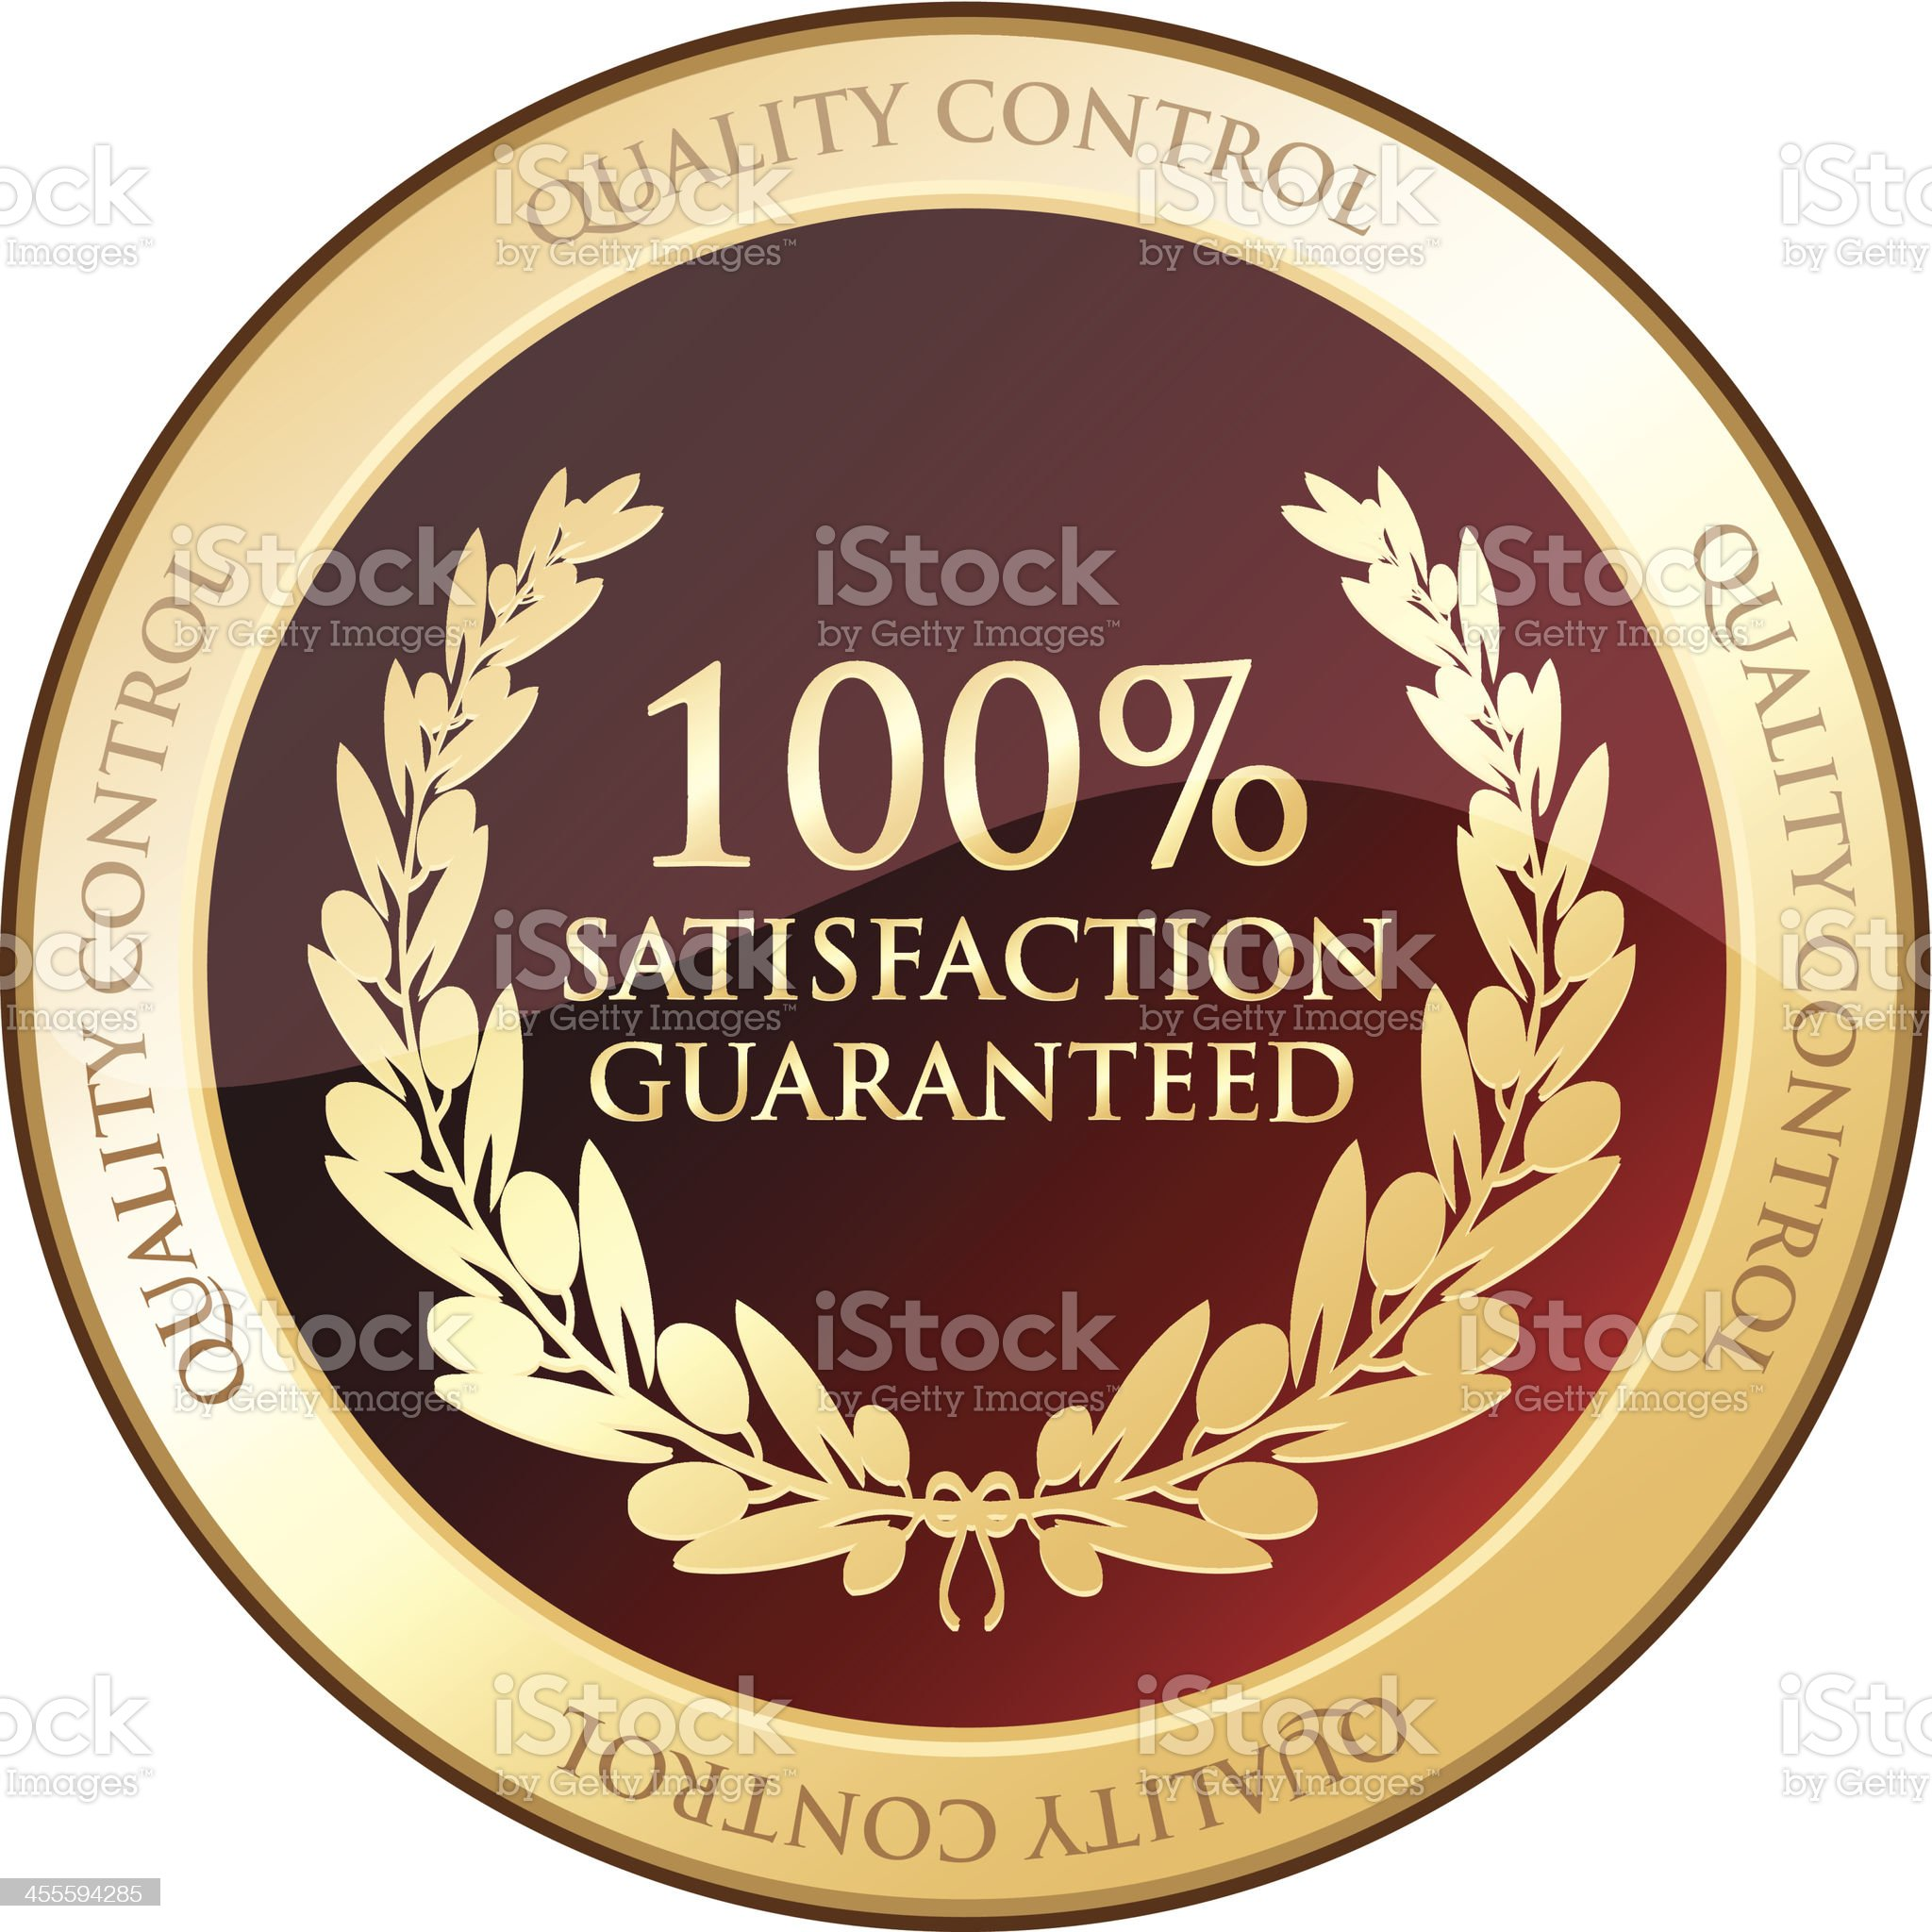 Satisfaction Guaranteed royalty-free stock vector art